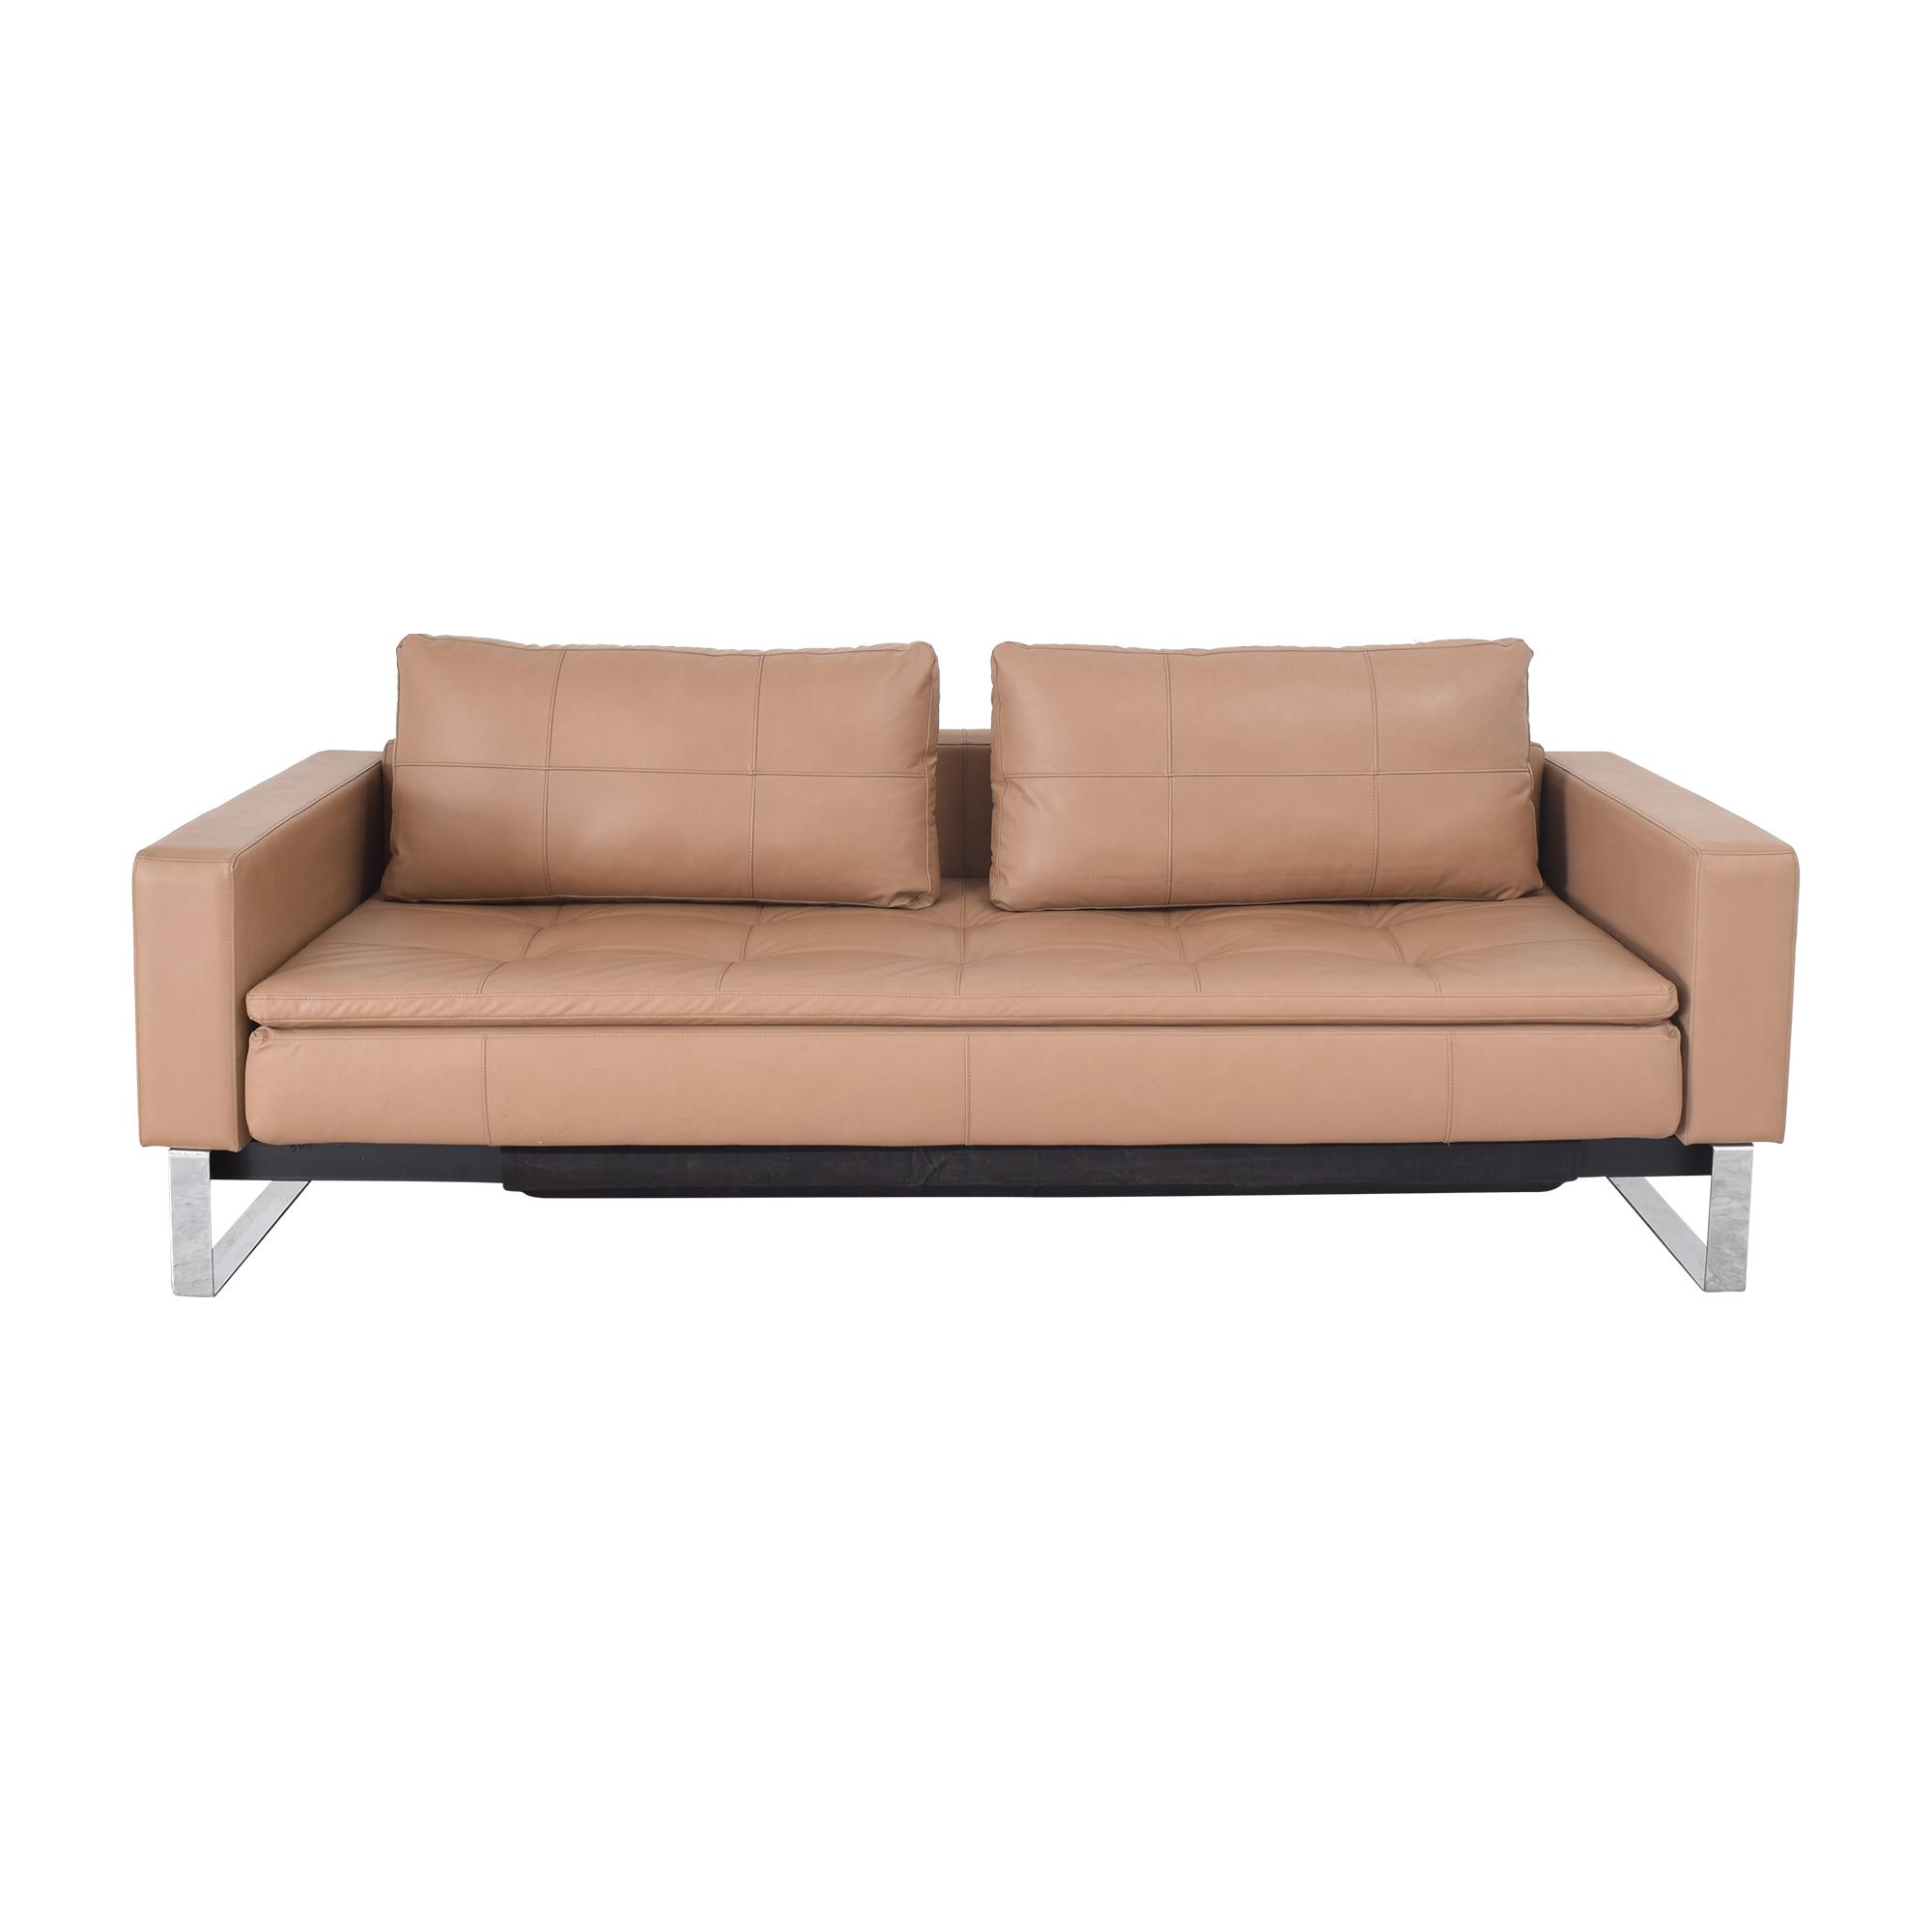 Innovation Living Innovation Living Tufted Sleeper Sofa pa